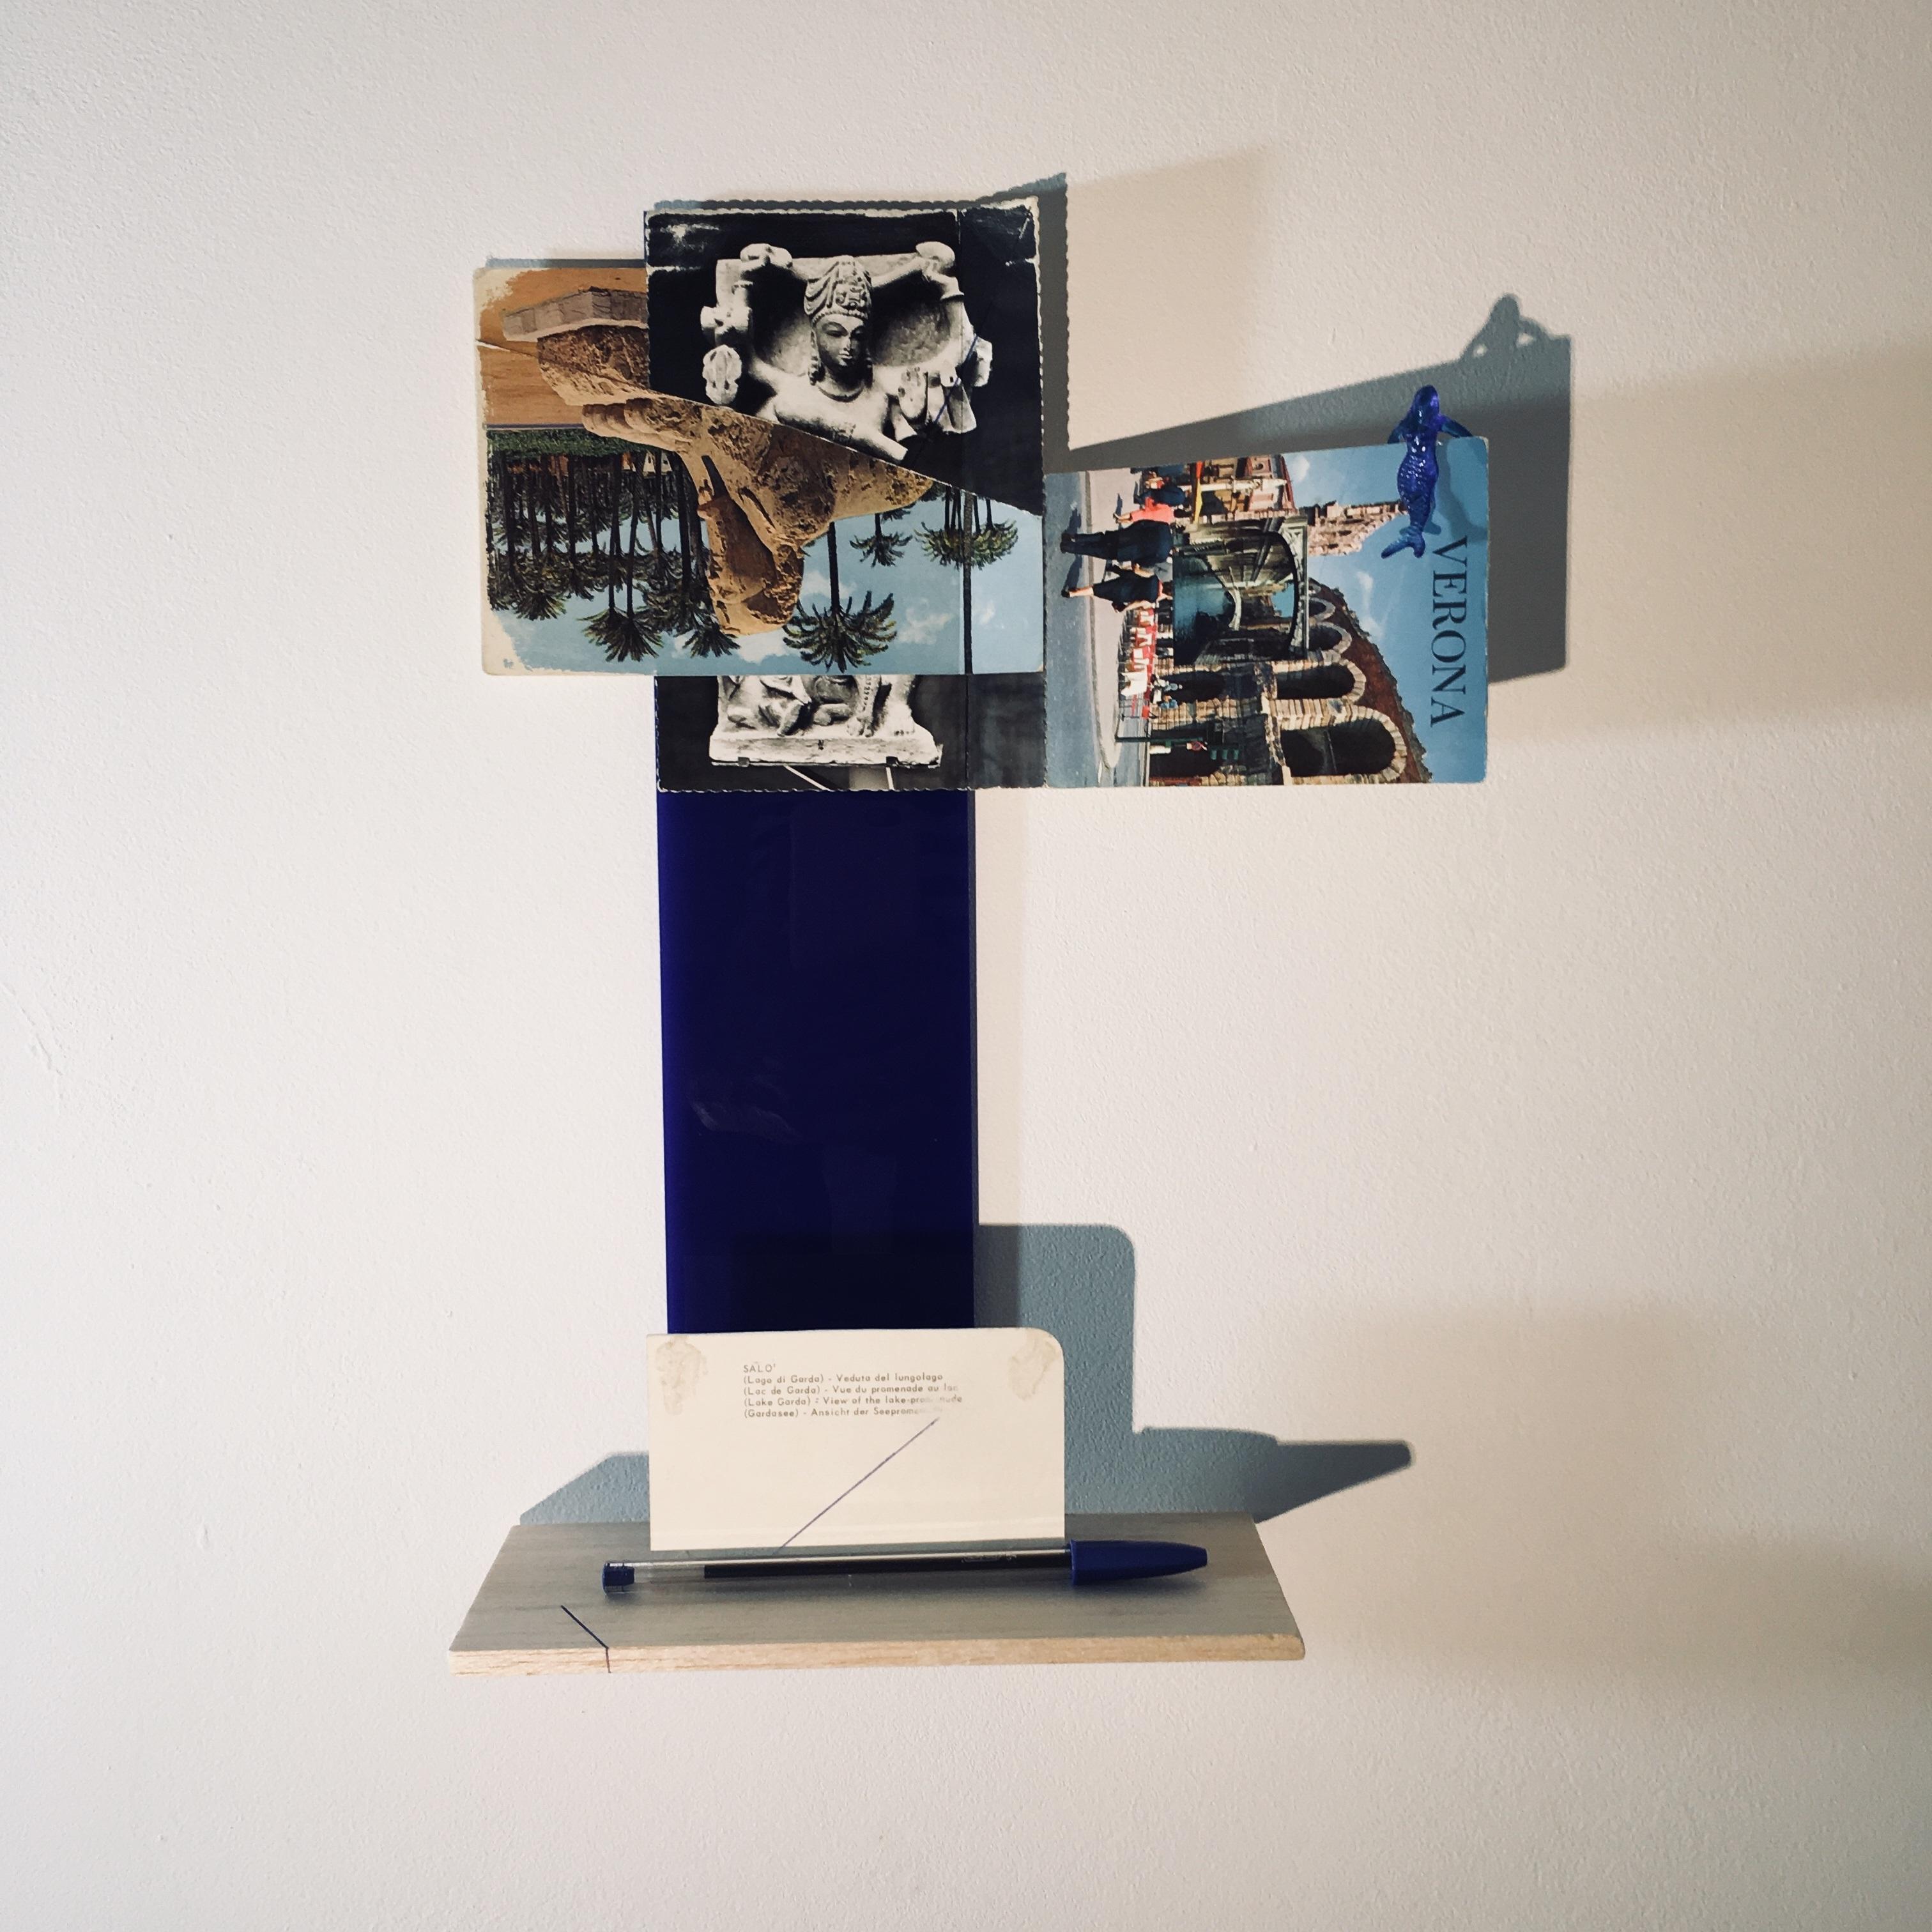 Gê Orthof, Máquinas mínimas, Salo' çiva verona sphinx, Acrílico, postais, balsa e miniatura plástica, desenho-assemblage, 35 x 25 x 9 cm, 2018